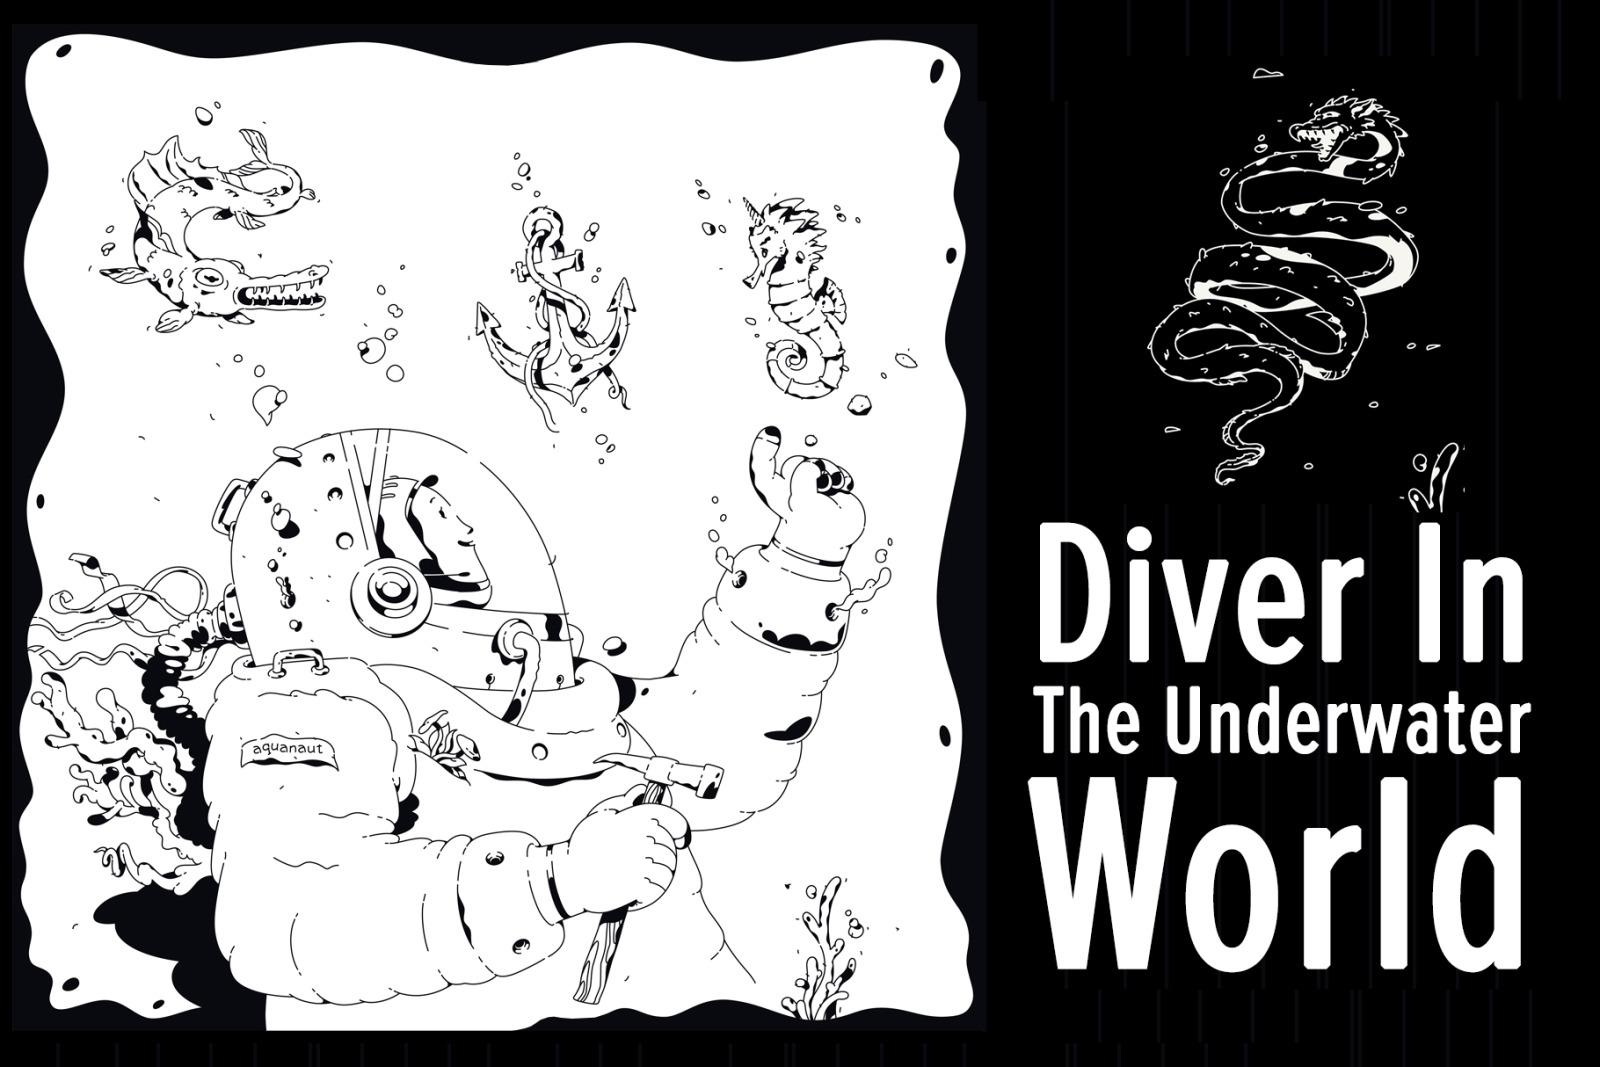 Illustration of a diver among underwater inhabitants